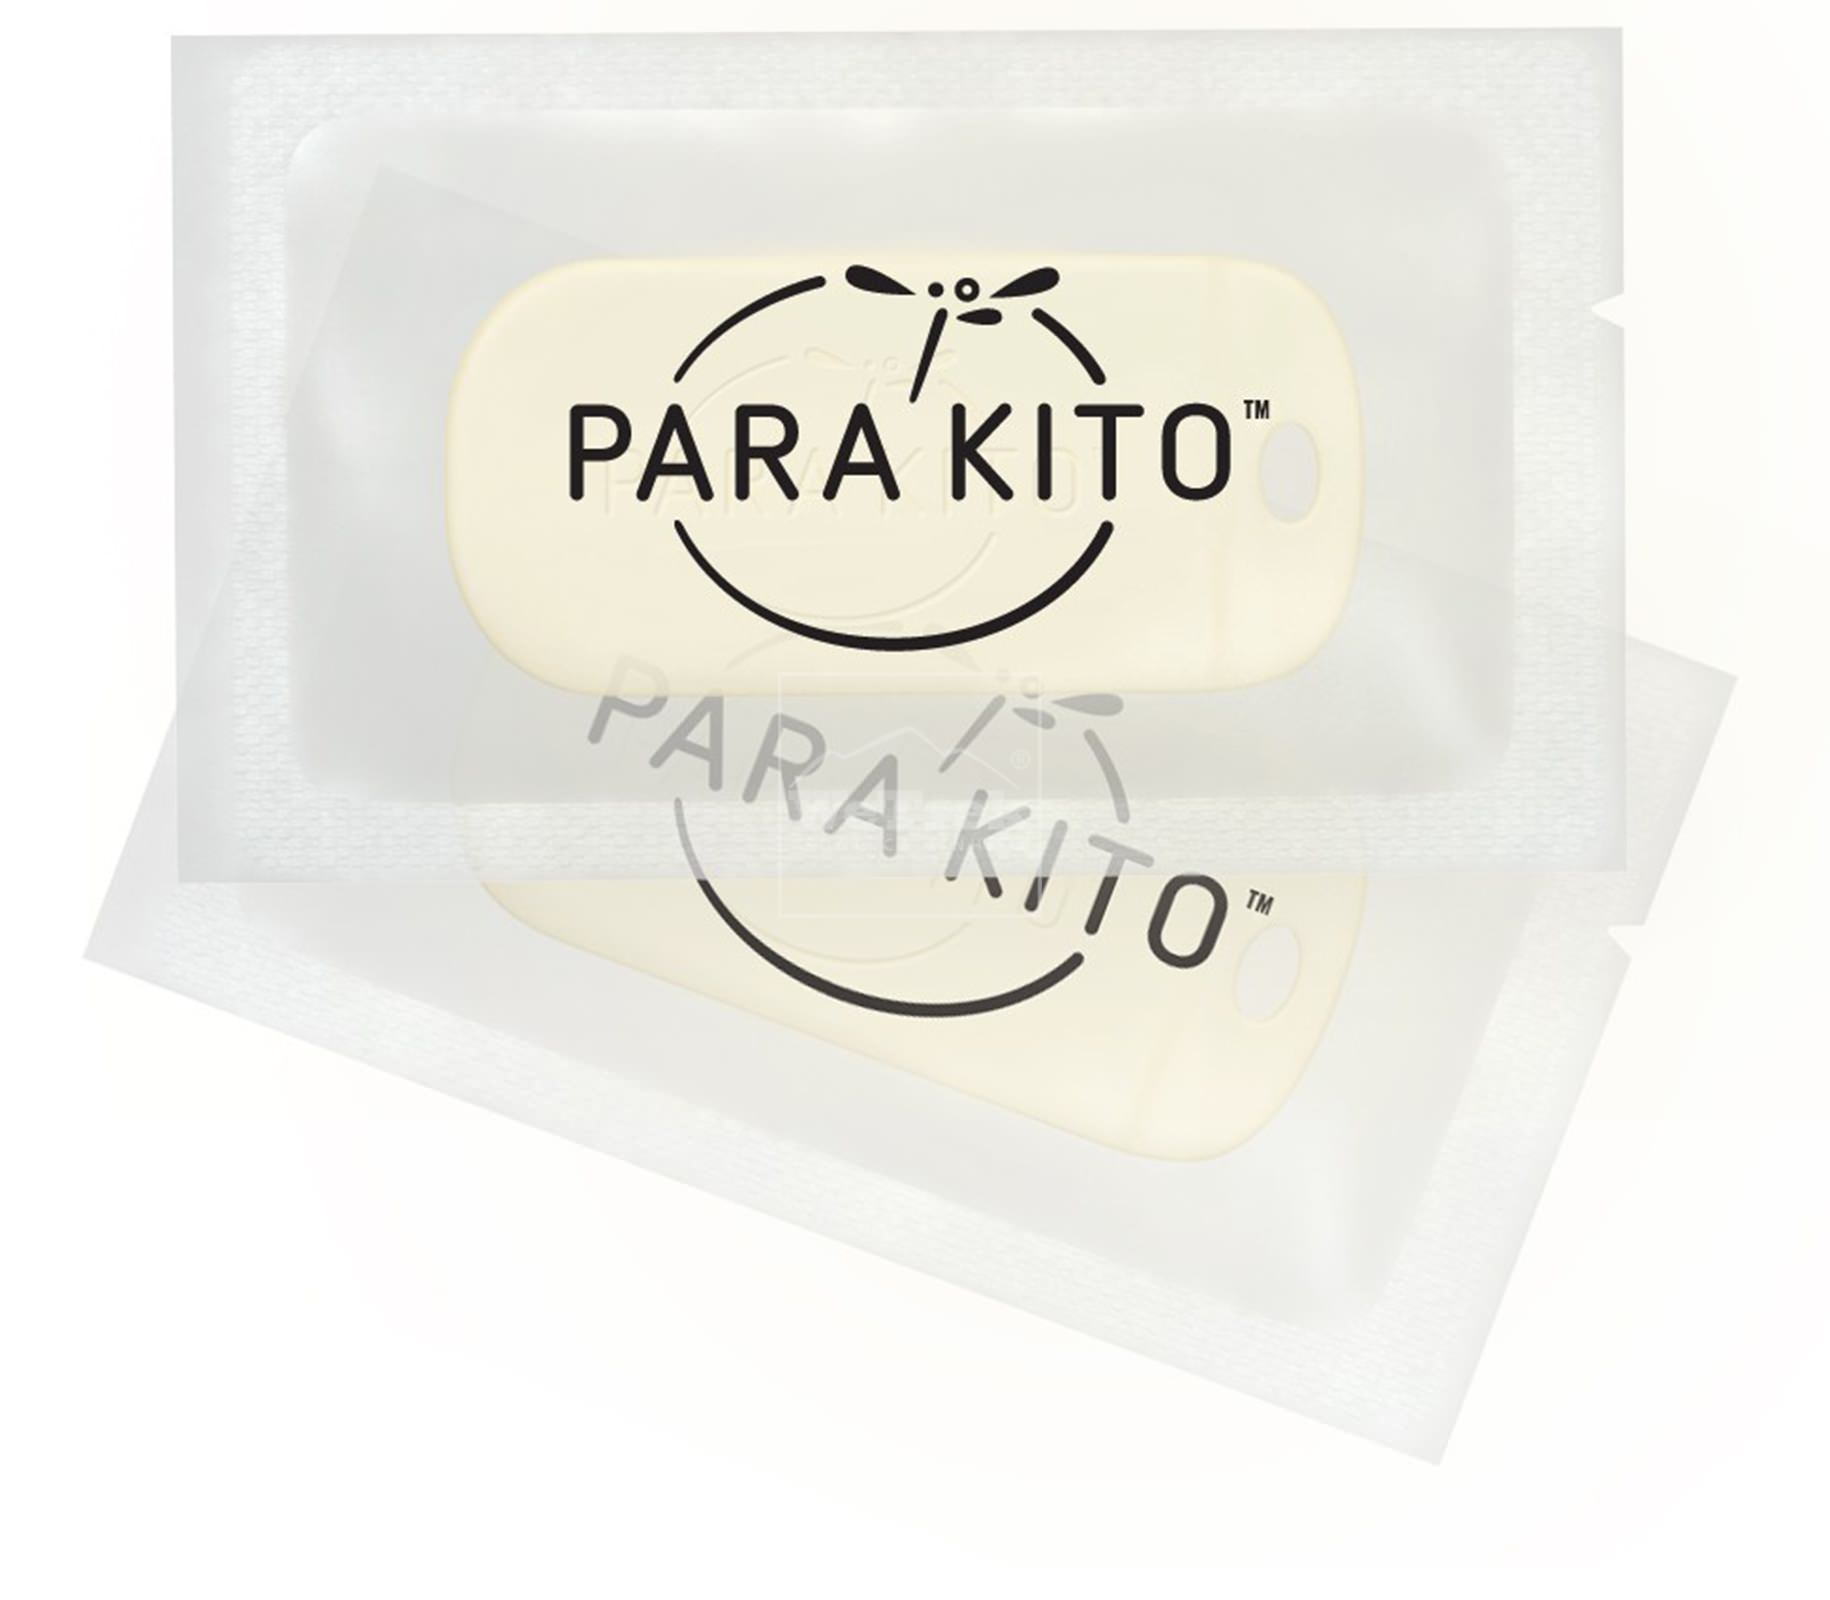 sap-chong-muoi-kem-vong-tay-parakito-sakura-band-7495-wetrek.vn-3